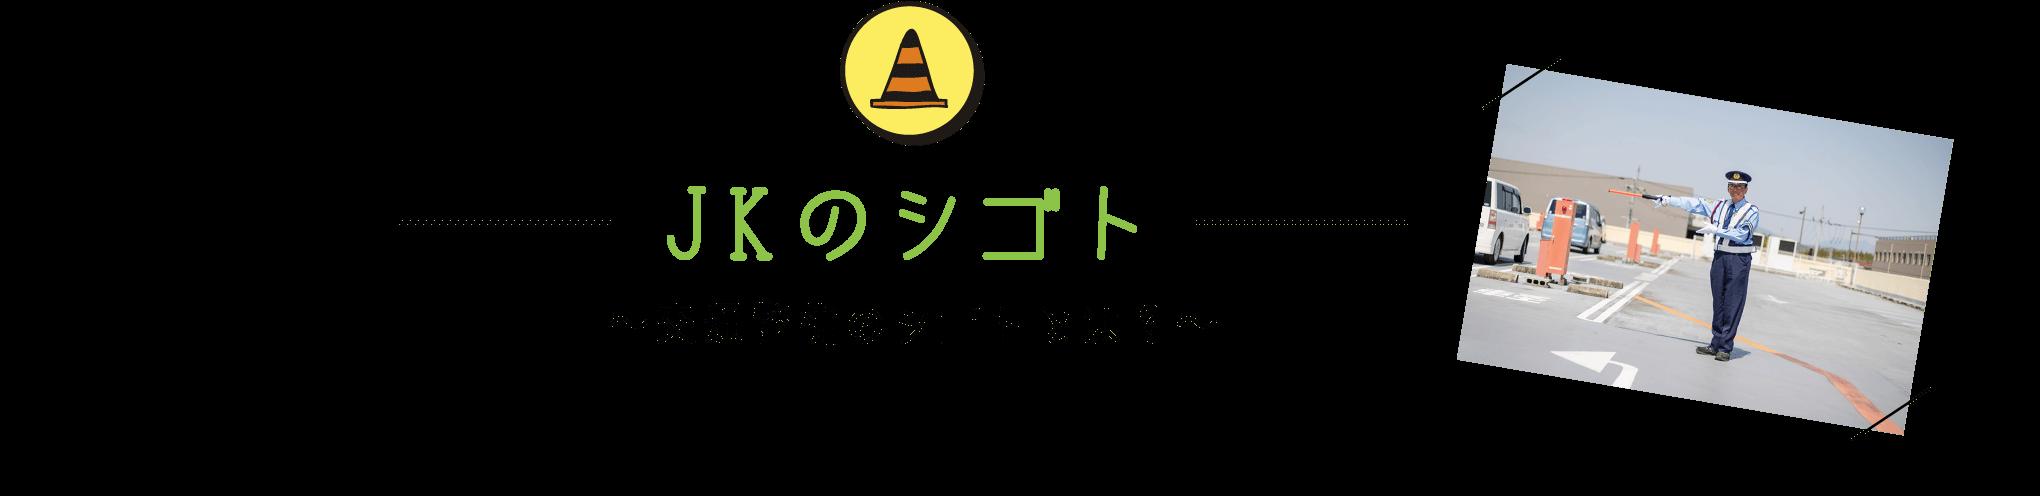 JKのシゴト / 〜交通警備のシゴトとは?〜